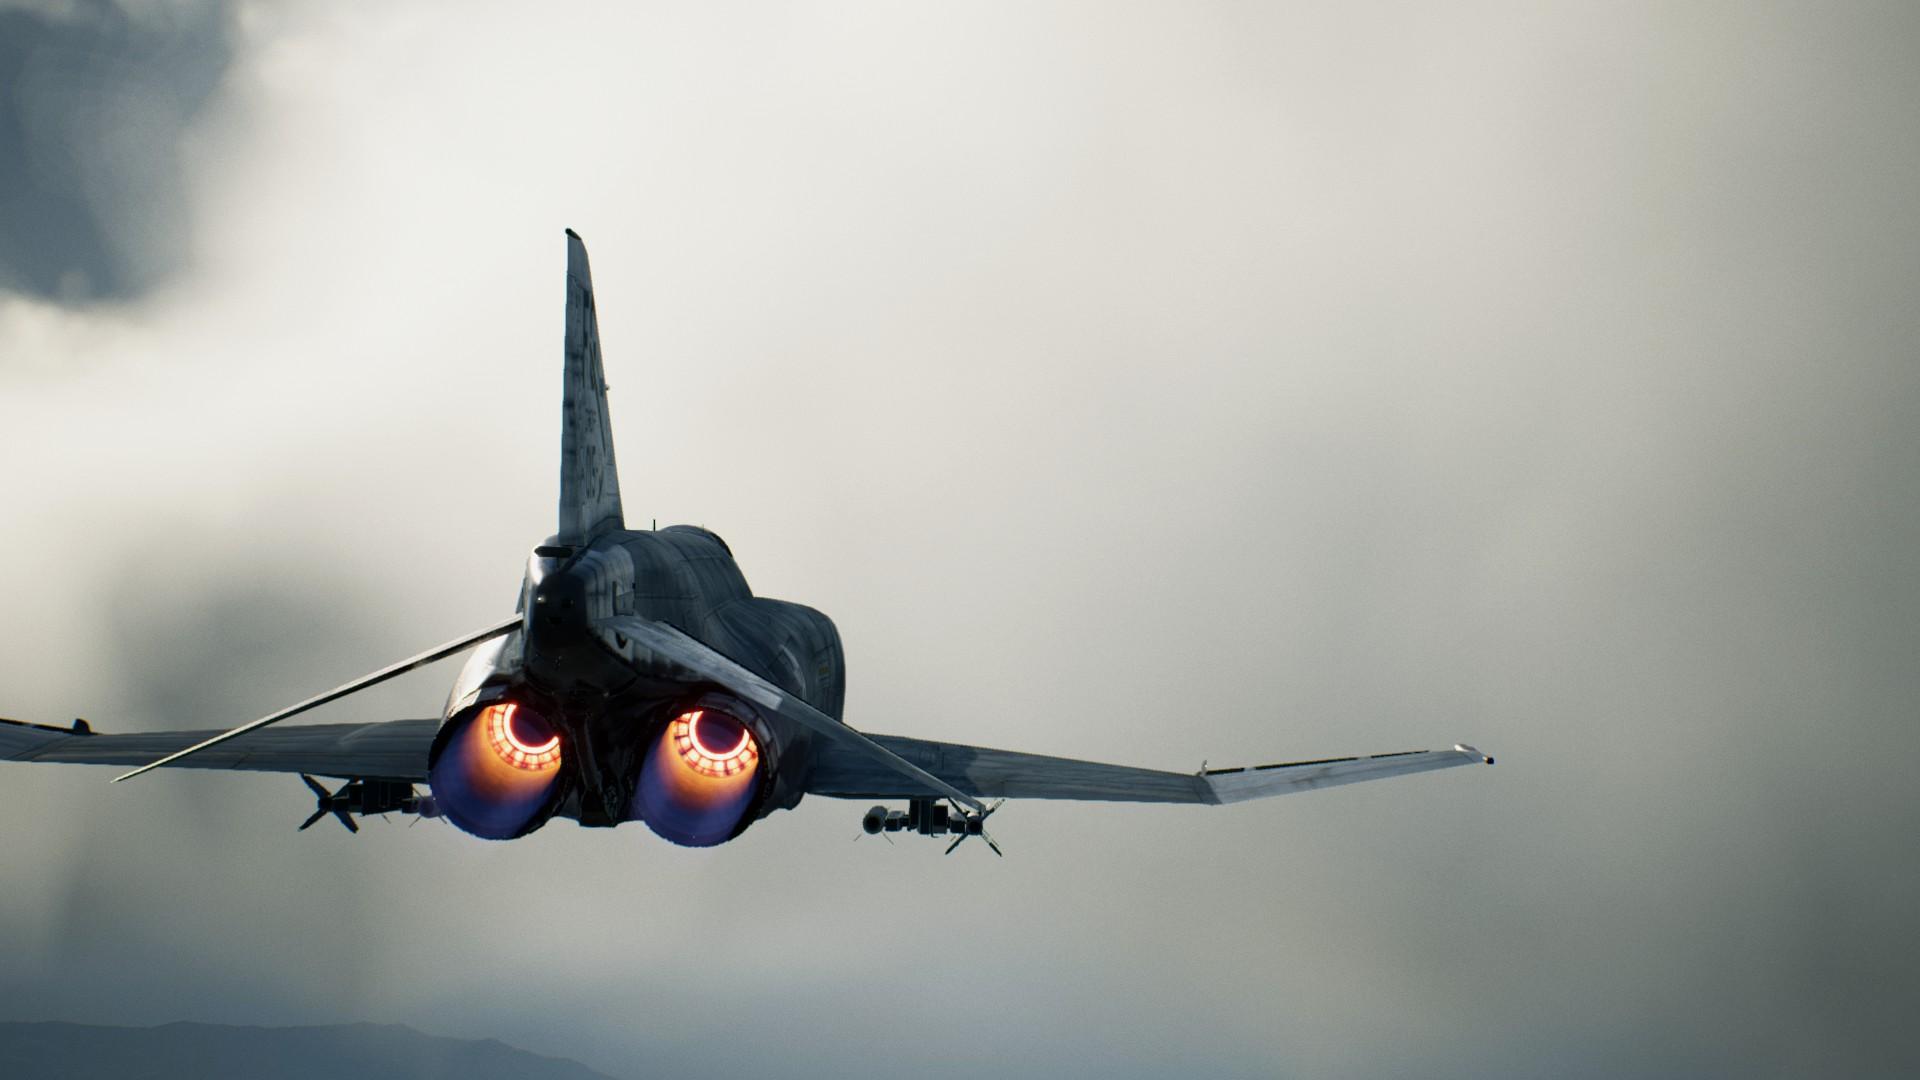 Wallpaper : Ace Combat, jet fighter, air, war, Video Game